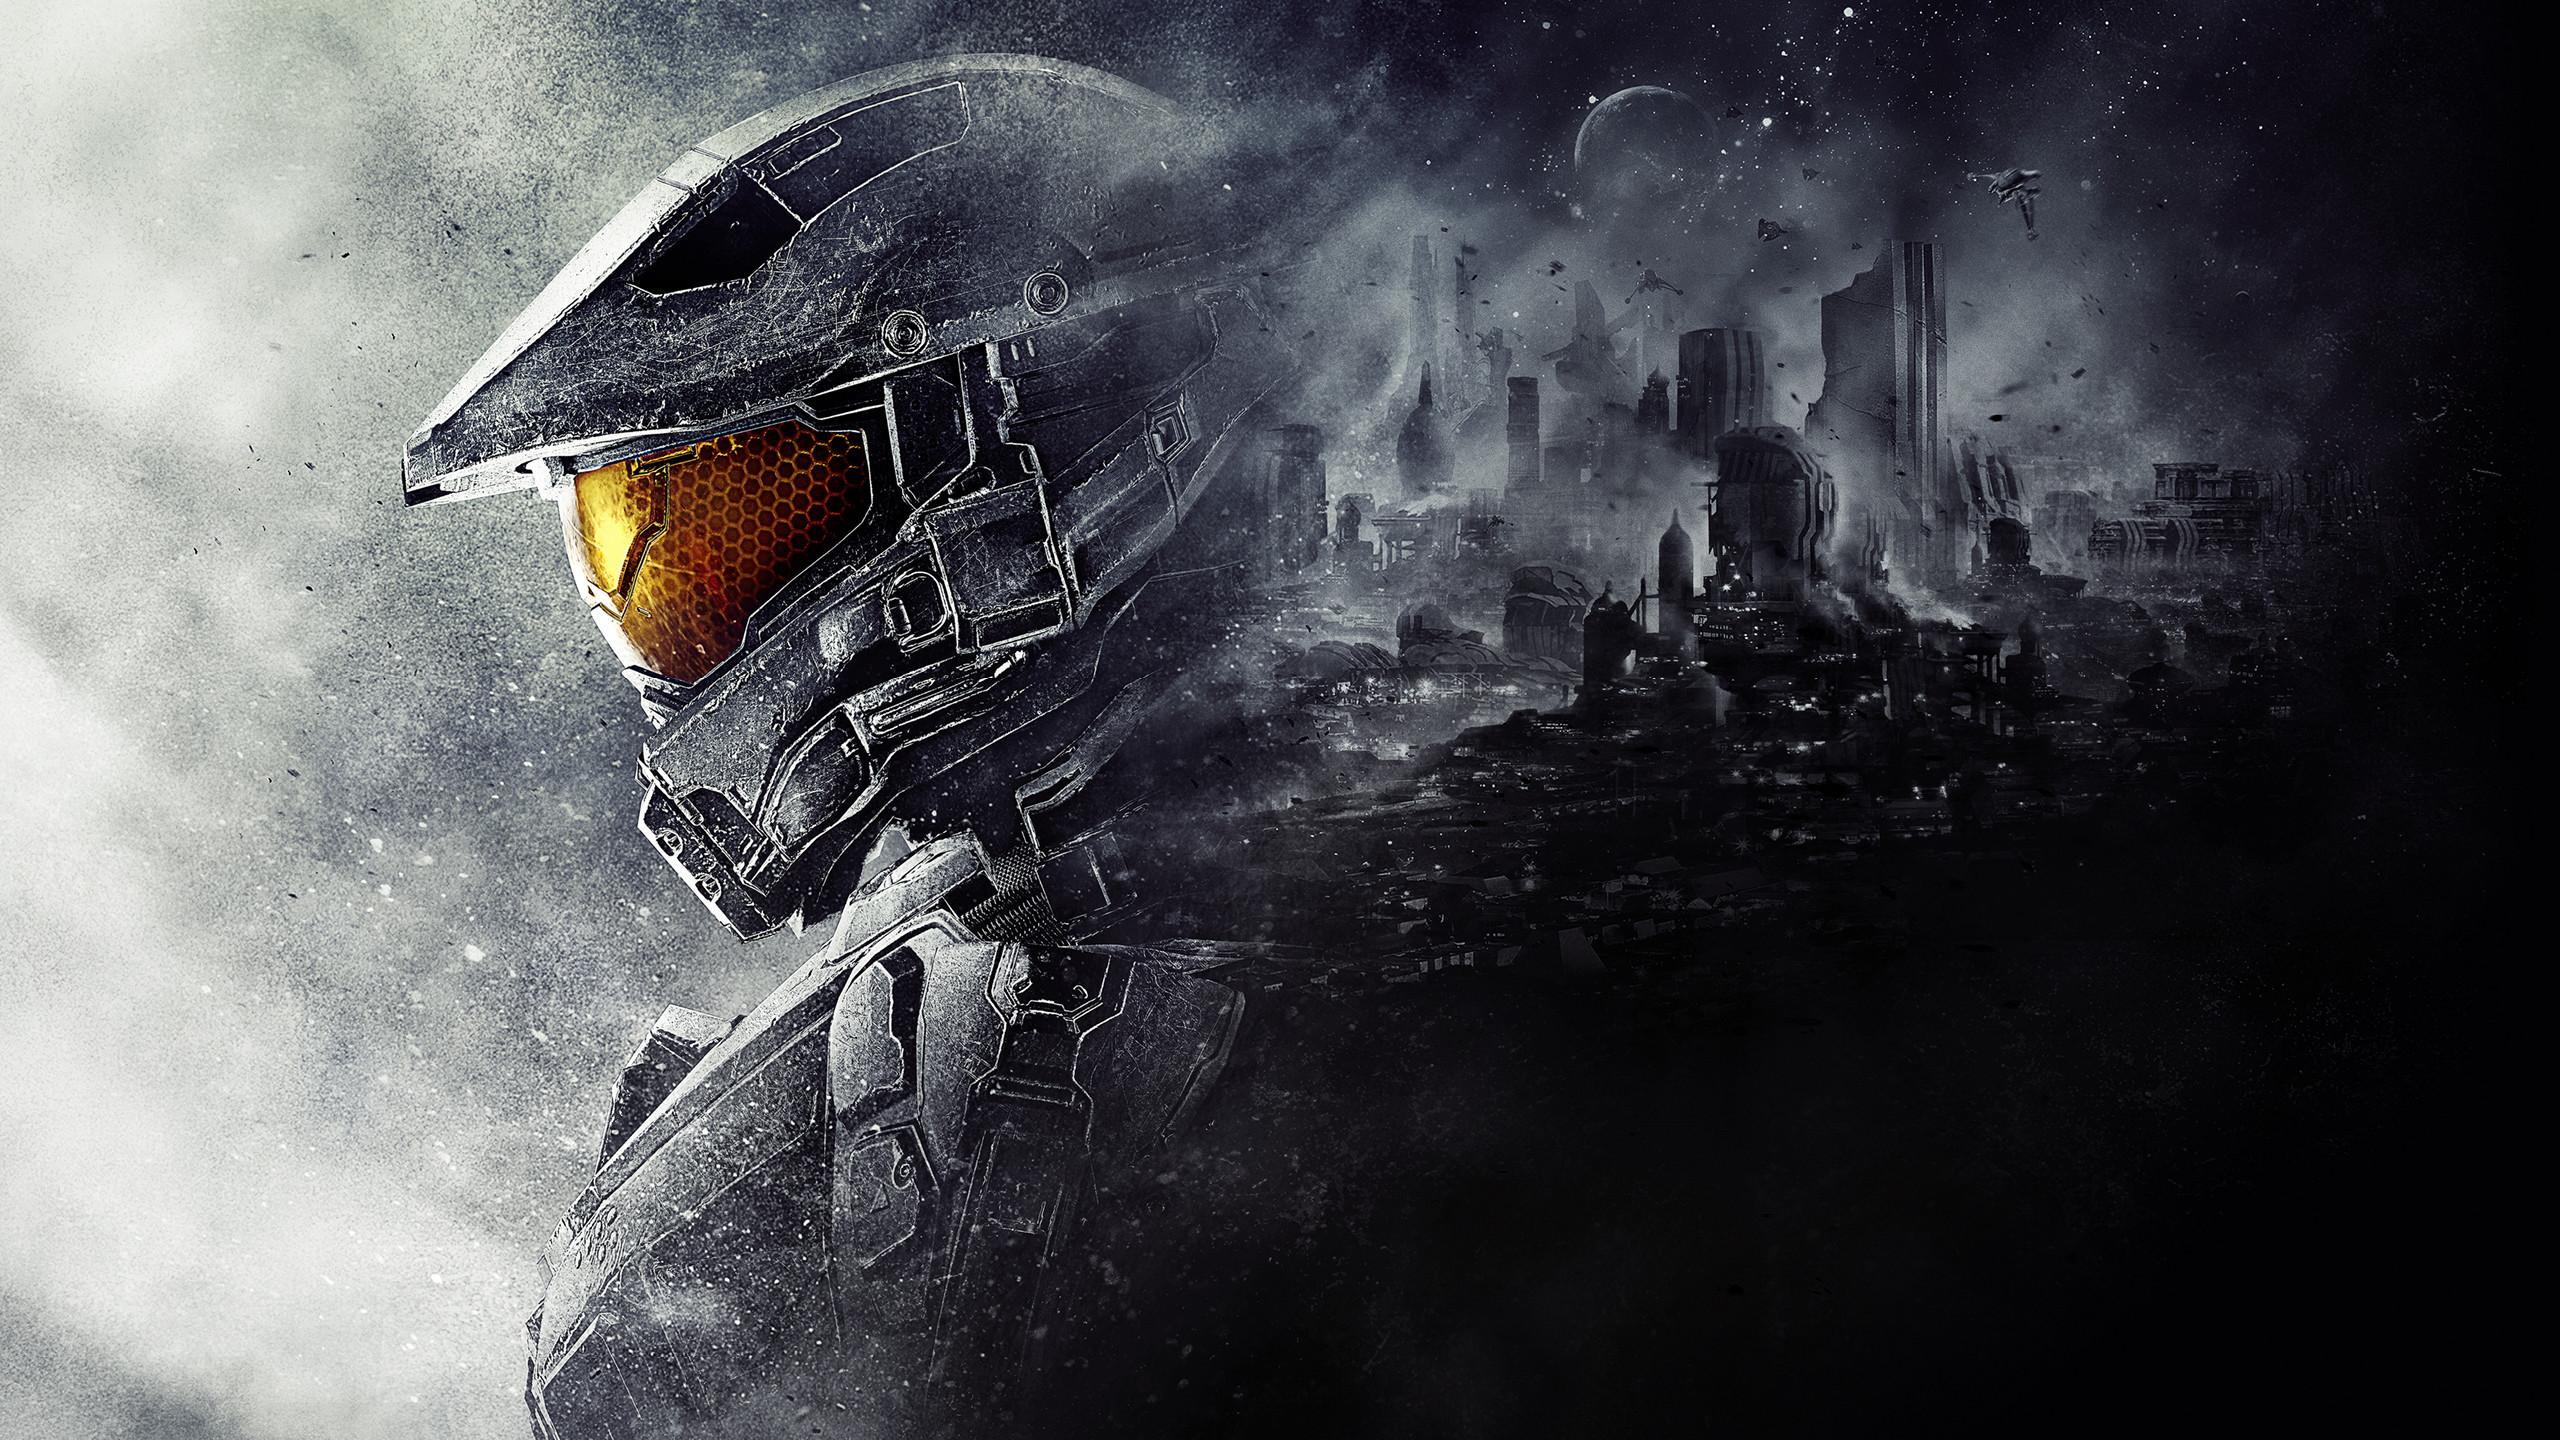 Halo 5 4K Wallpaper (62+ images)